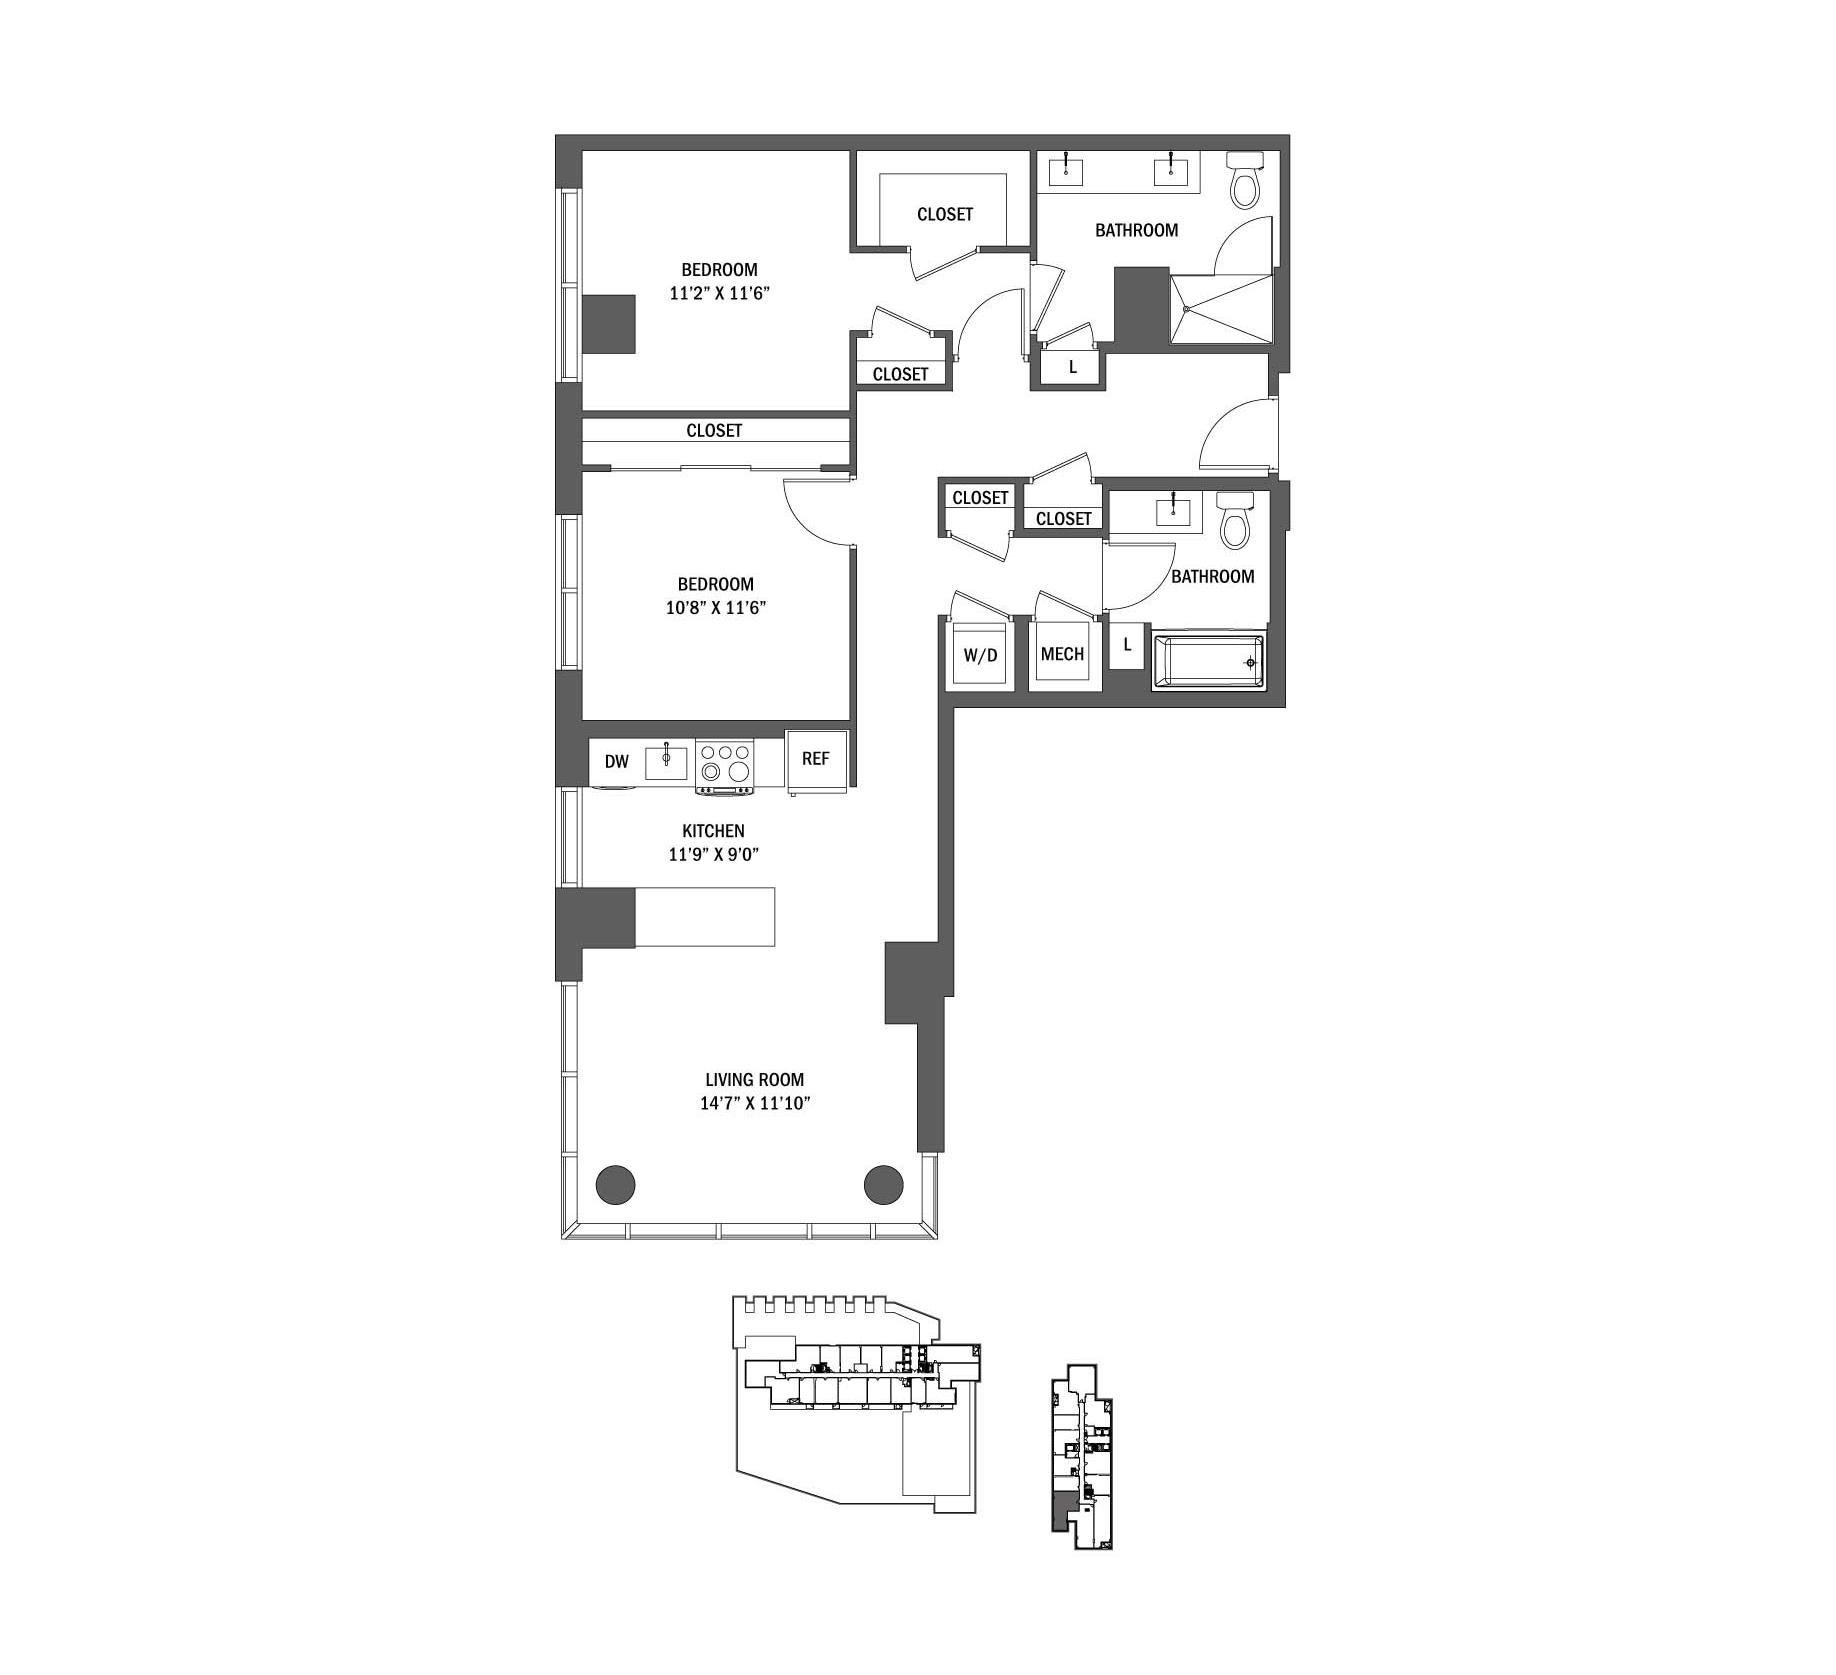 P0625338 789bc28 e08 02 2 floorplan